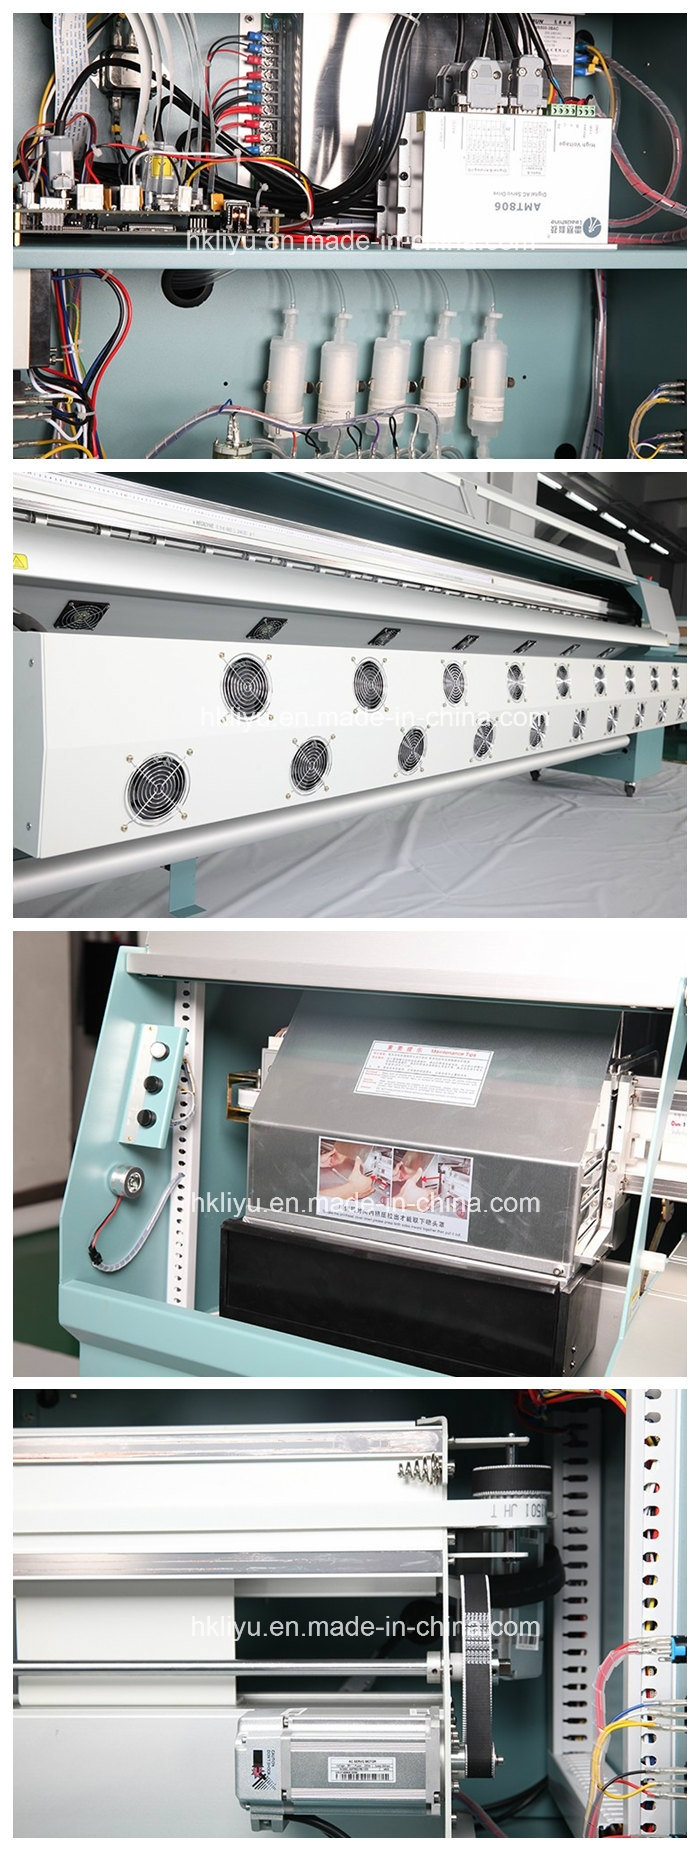 10 Feet Large Format Solvent Inkjet Printer Infiniti Fy-3208t Flex Banner Printing Machine